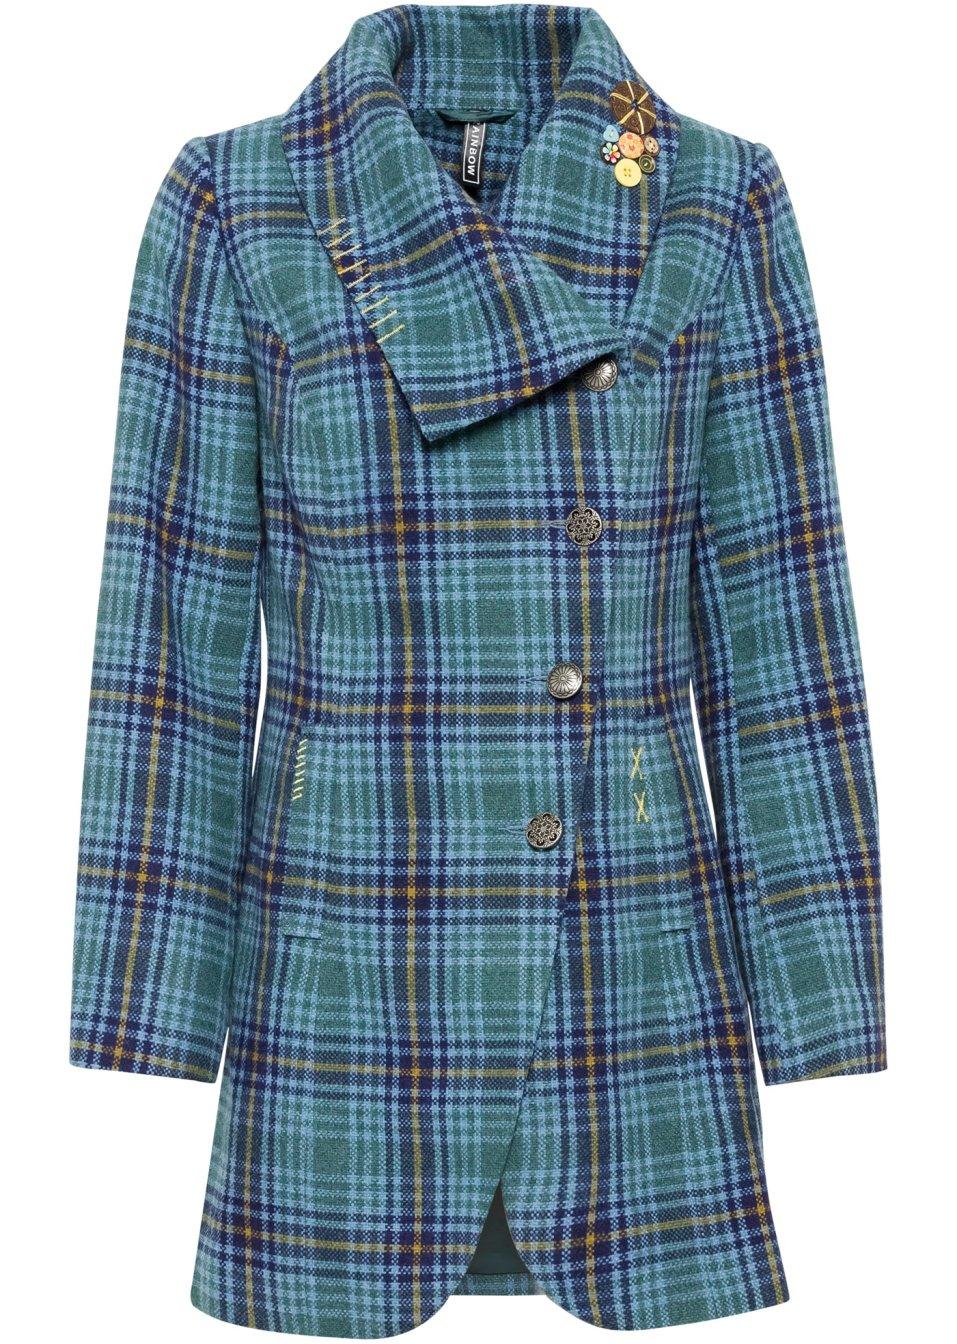 Mantel mit weitem Kragen Mantel mit weitem Kragen - Damen - bonprix.de bLnSY D3rGo